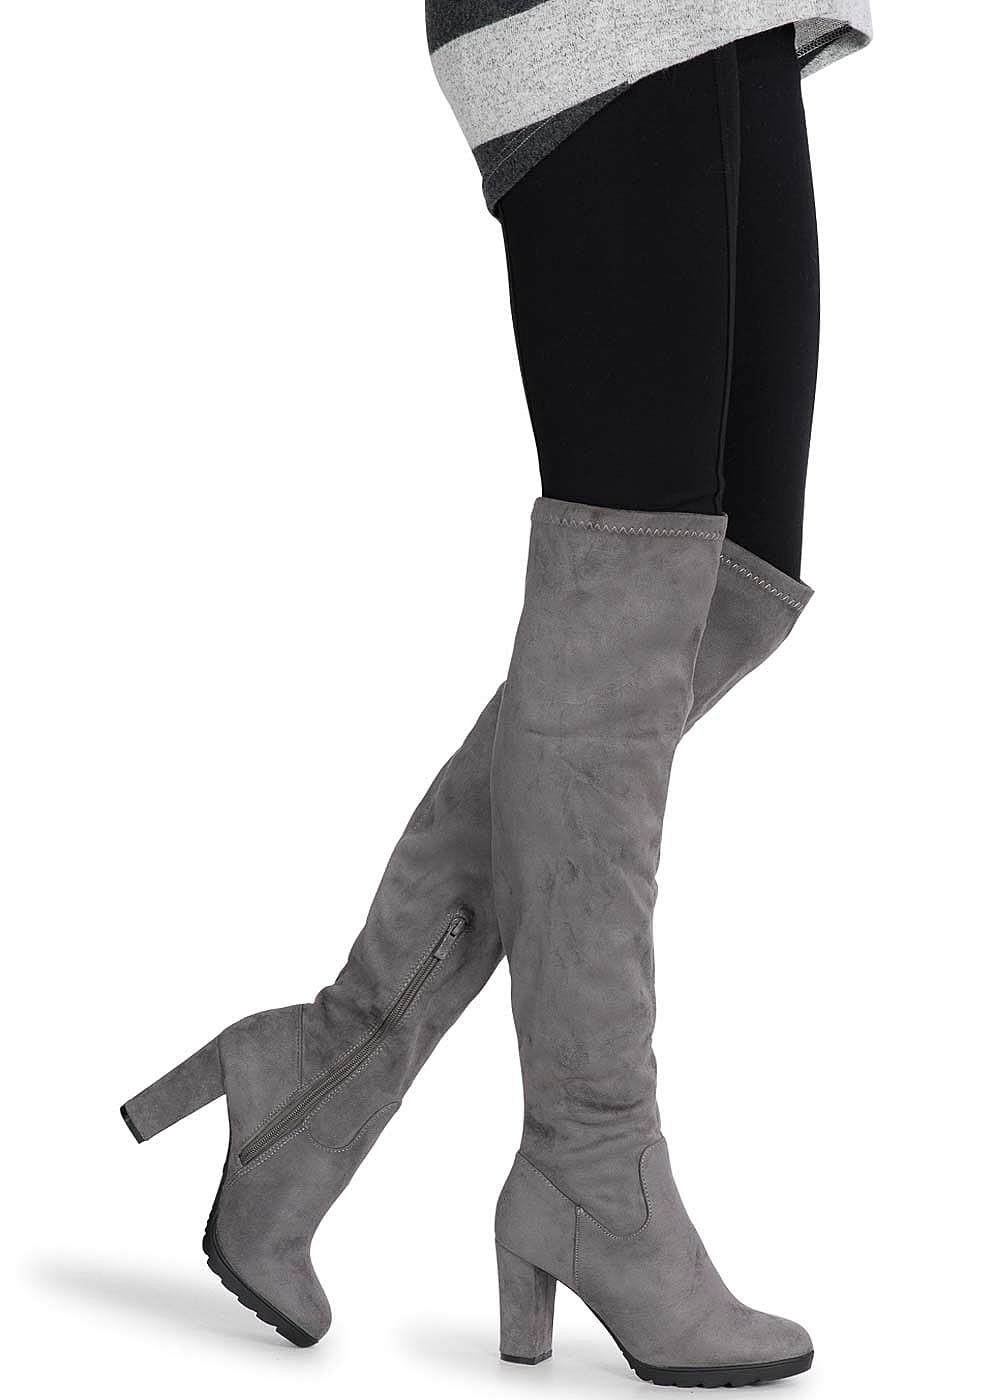 seventyseven lifestyle schuh overknee stiefel absatz 9cm. Black Bedroom Furniture Sets. Home Design Ideas